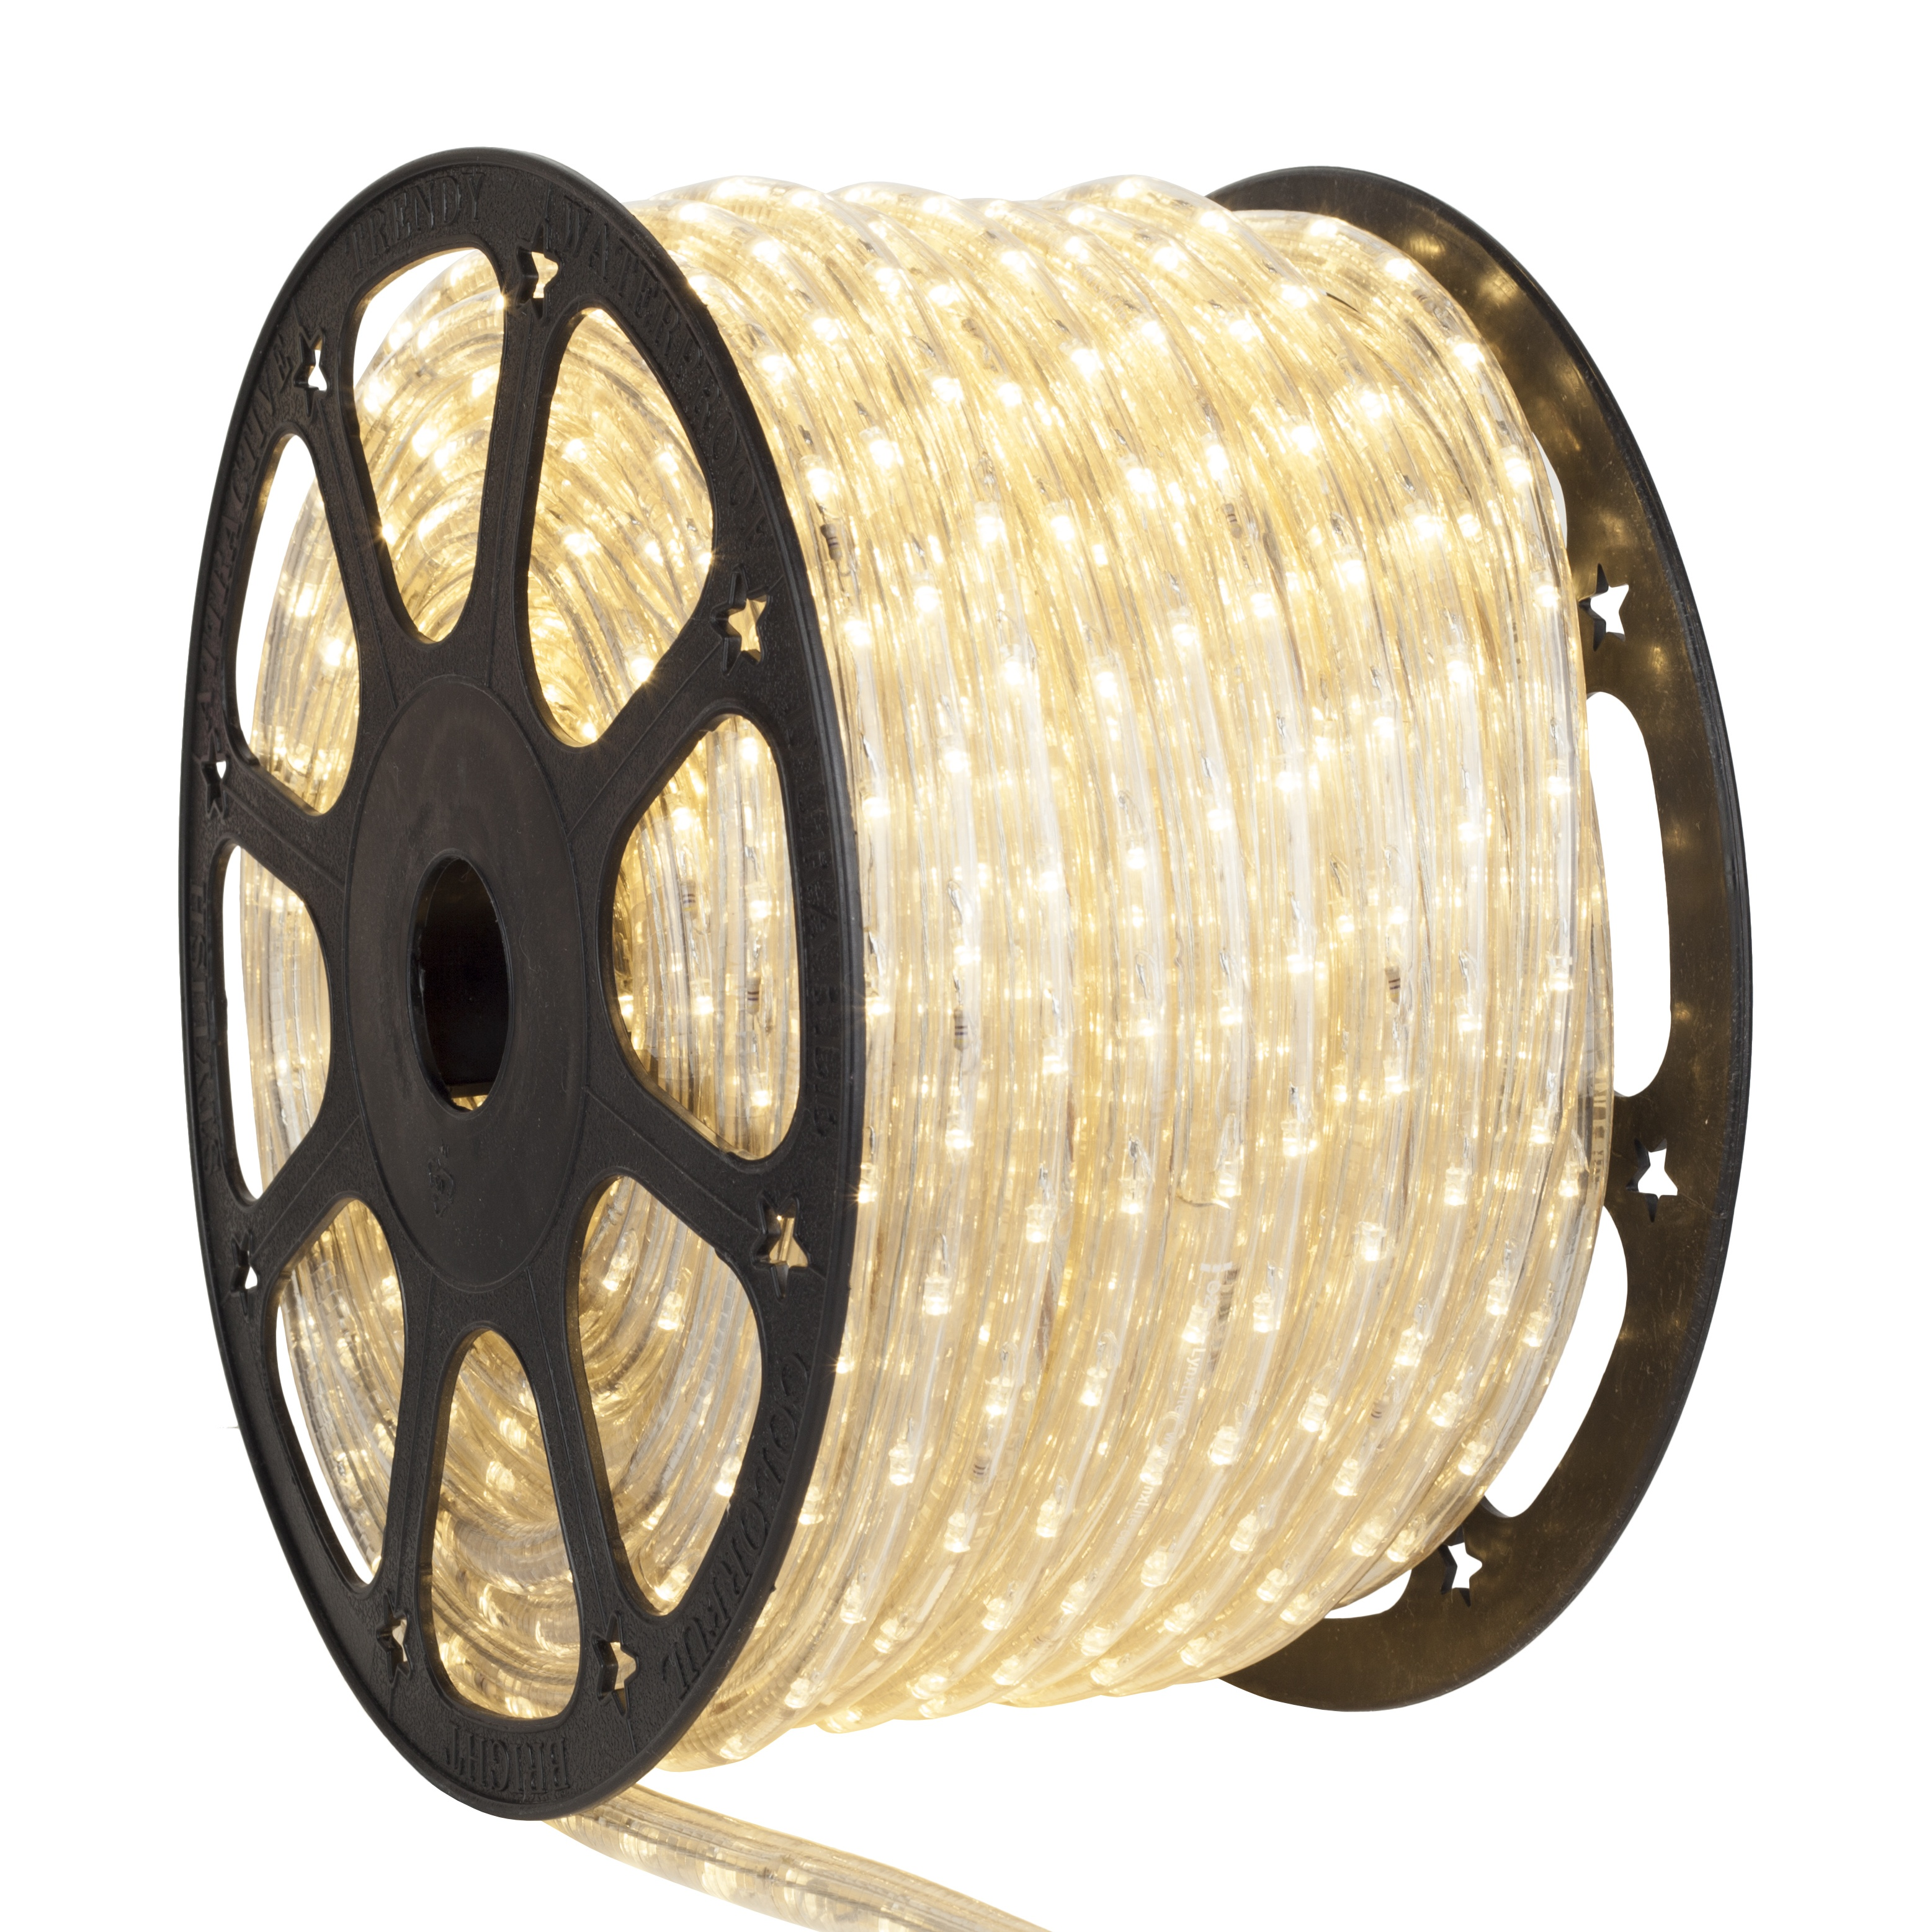 Warm White LED String Lights - 60 Lights